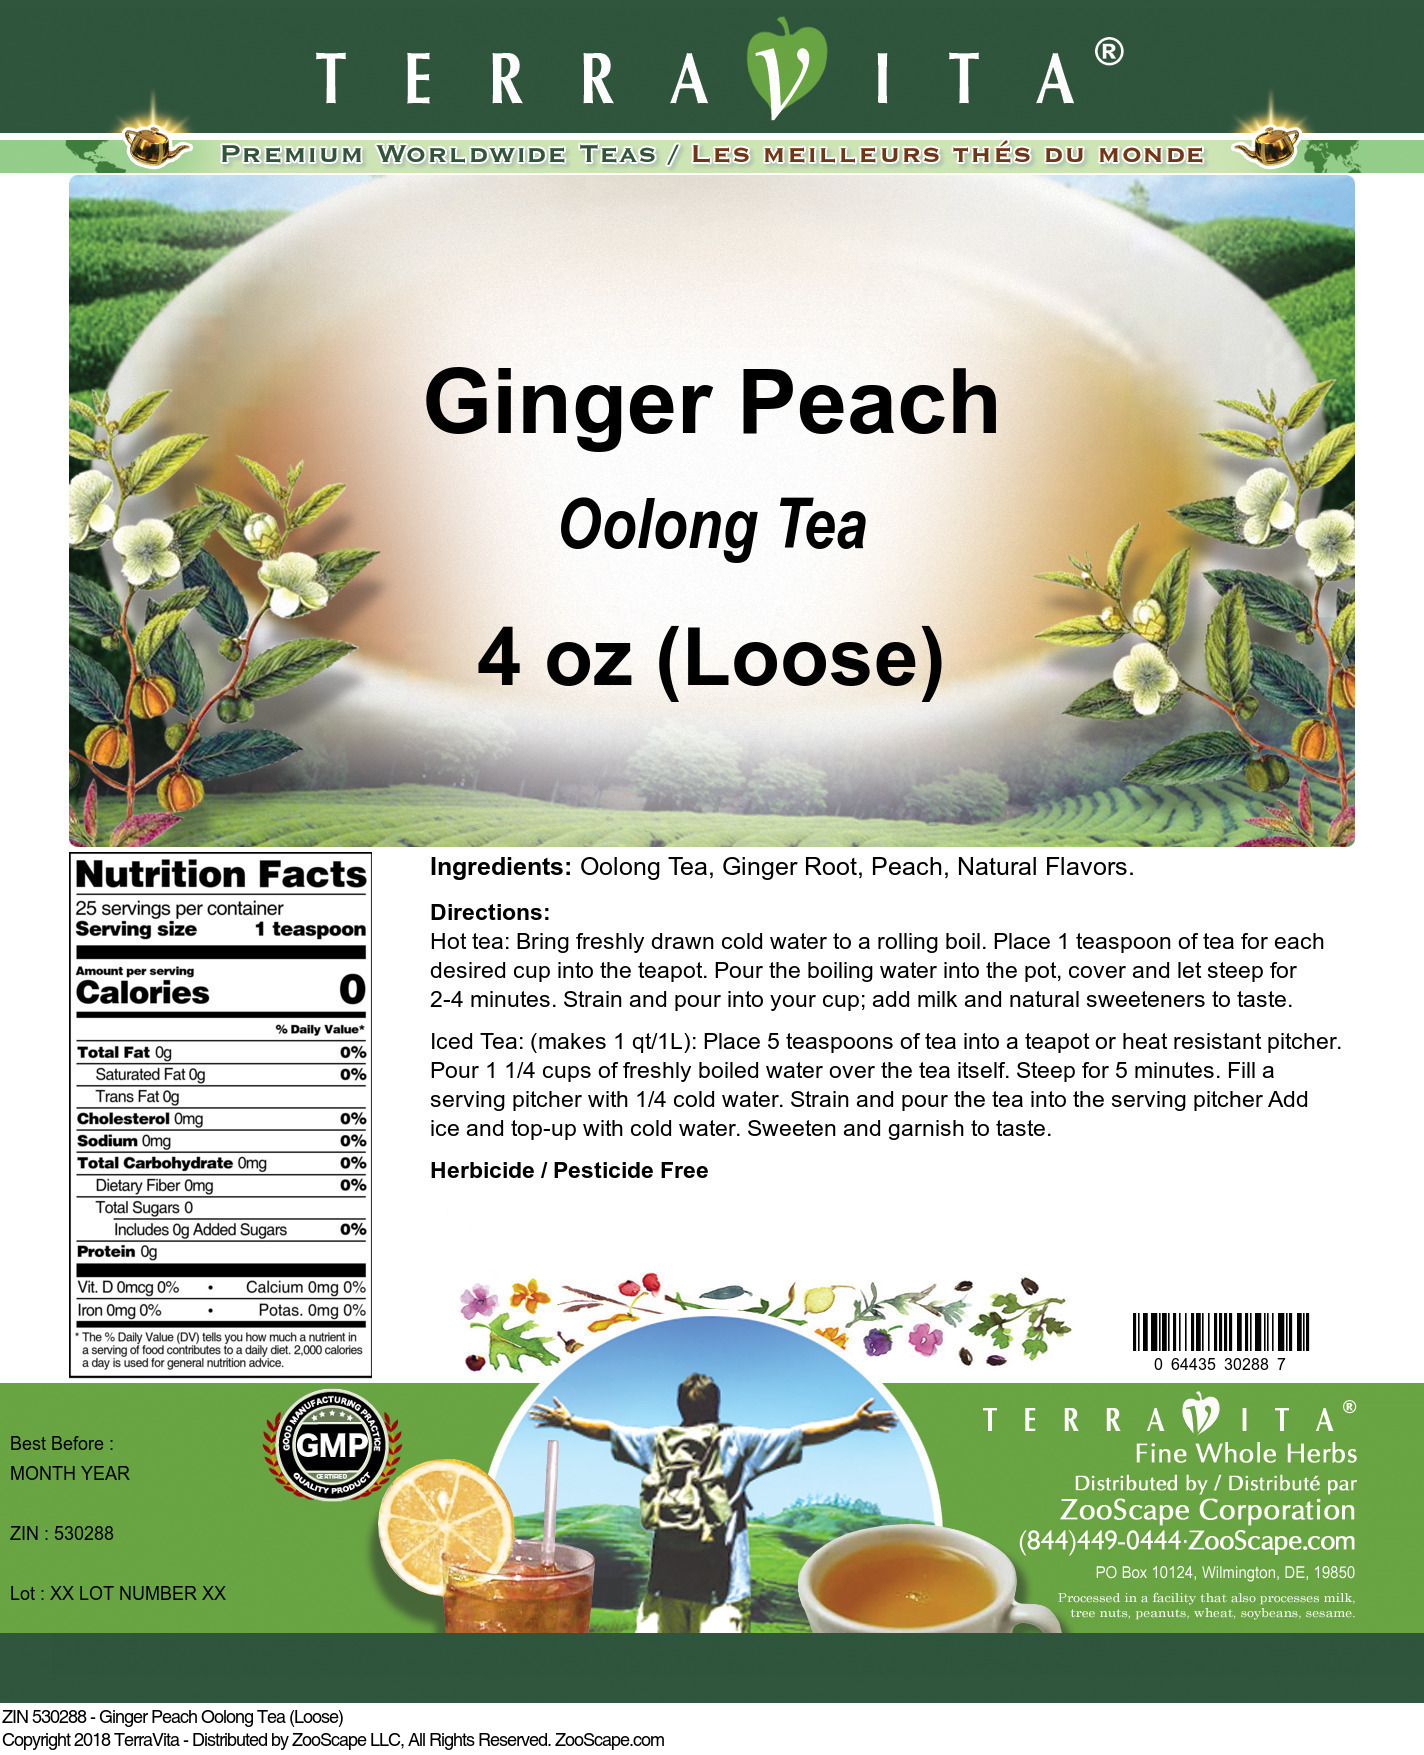 Ginger Peach Oolong Tea (Loose)